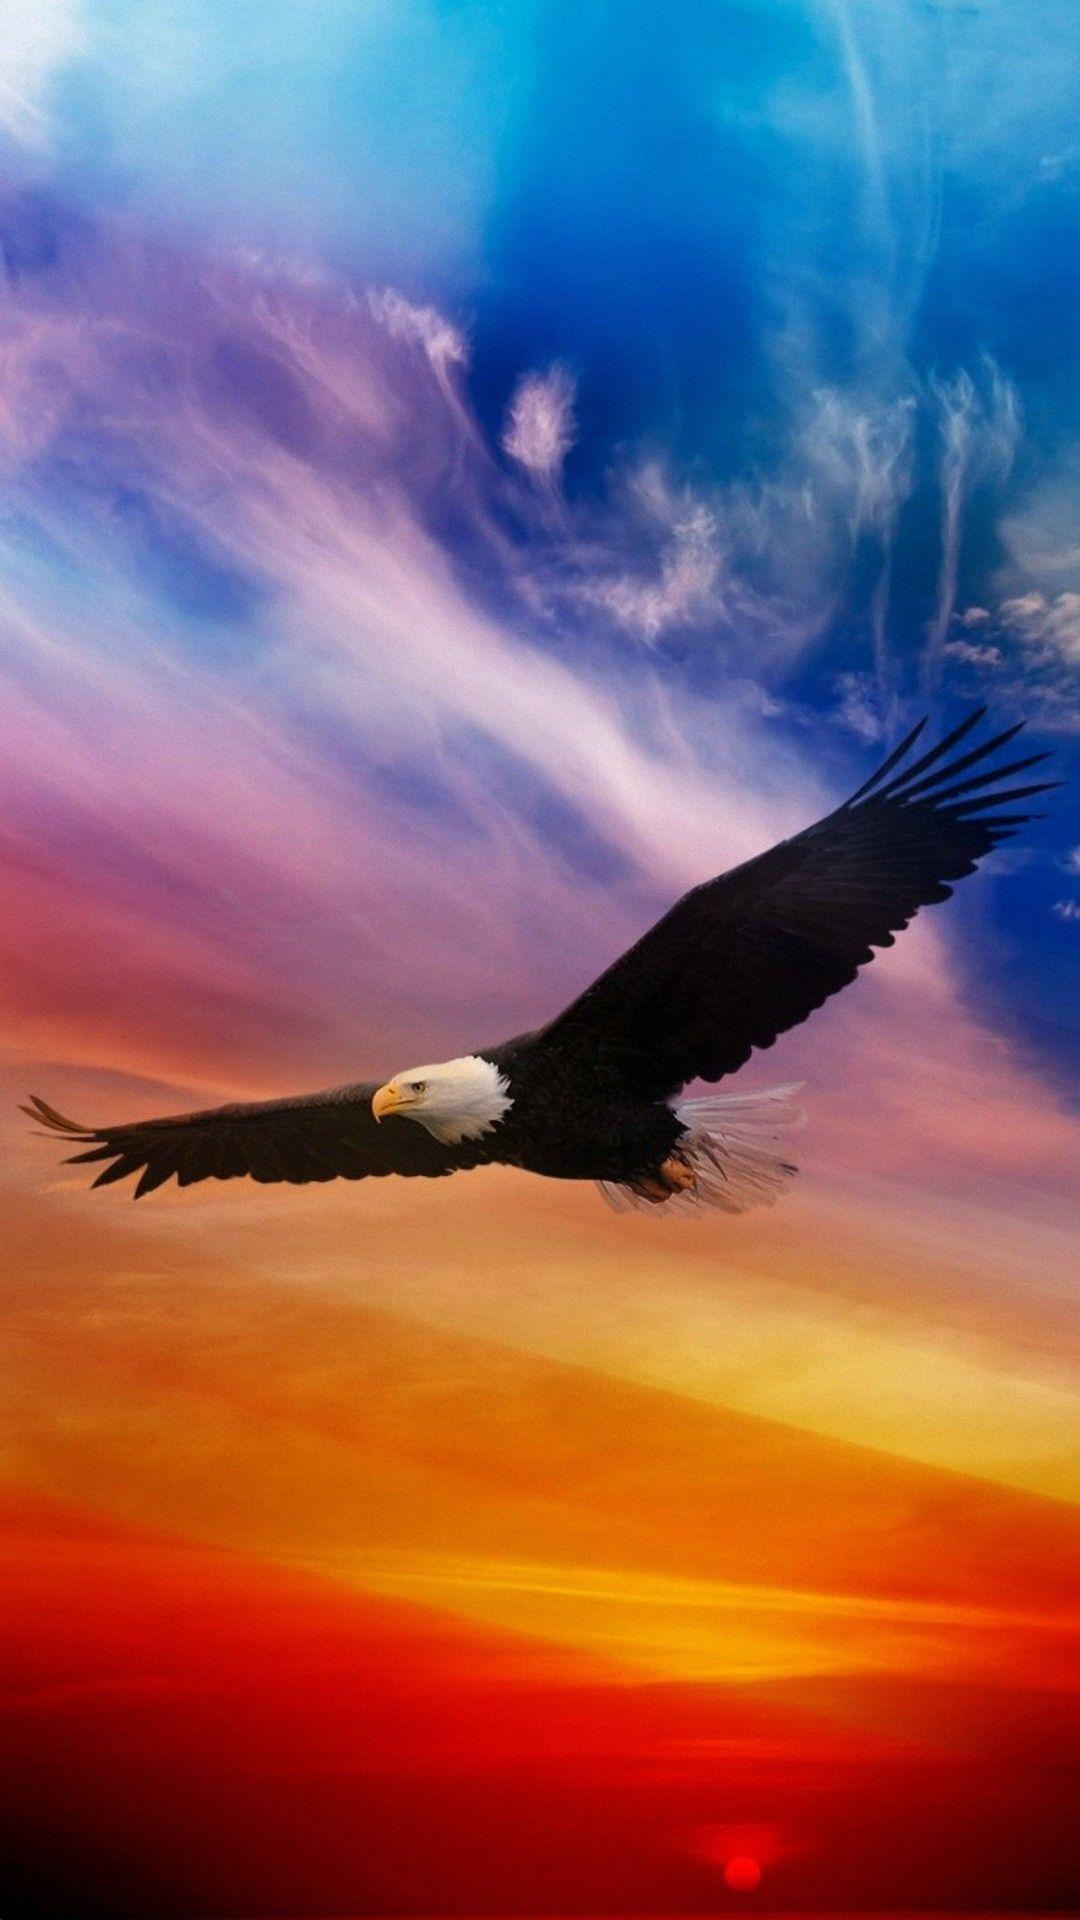 Eagle Wallpaper iPhone HD